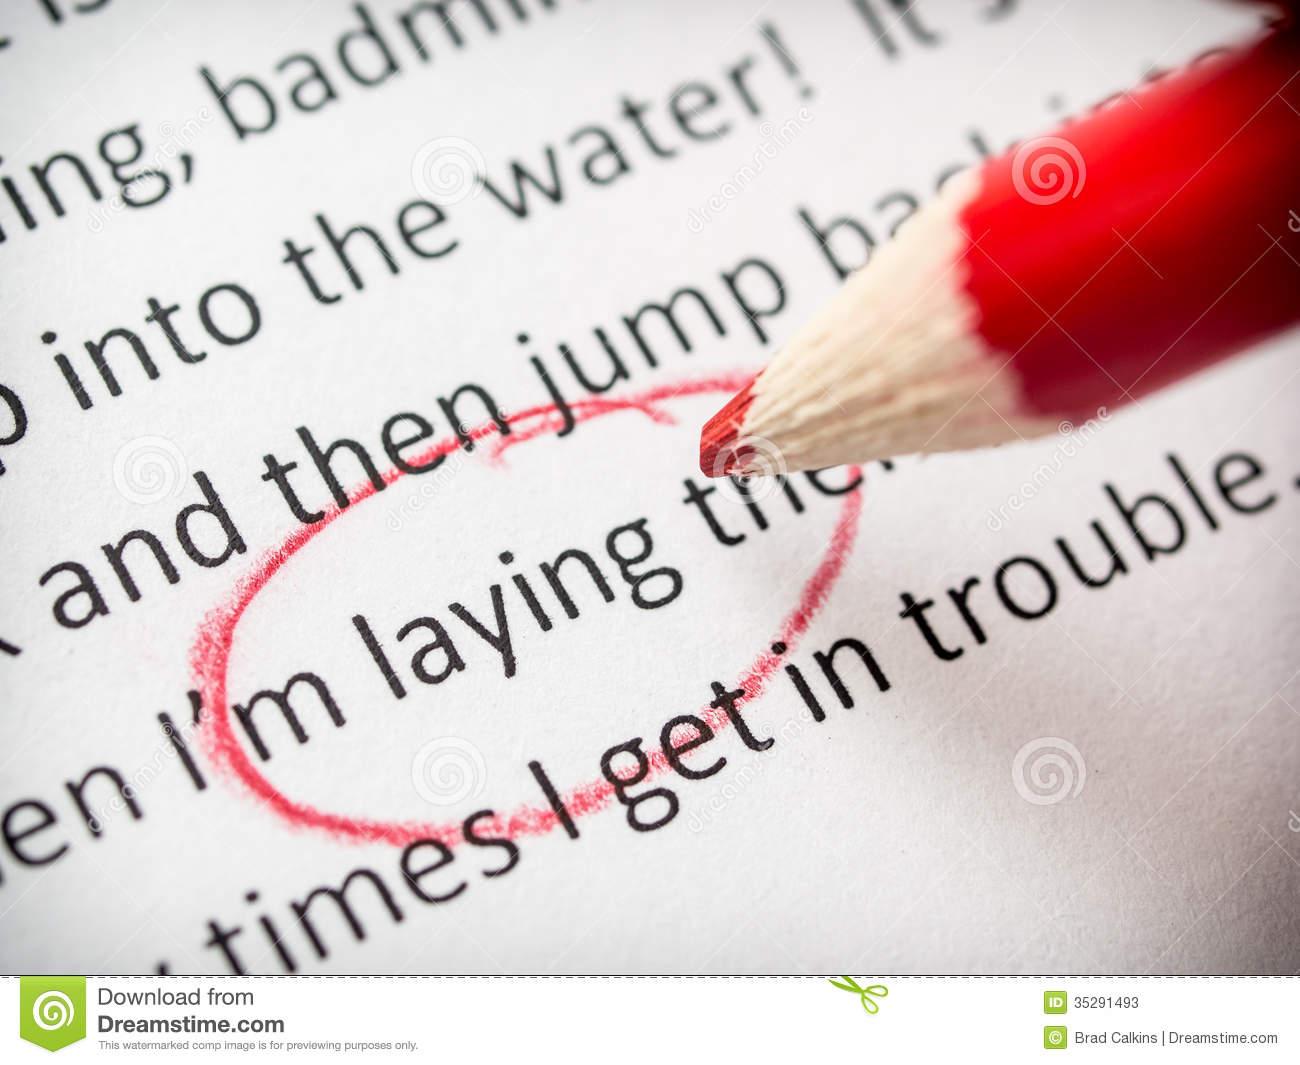 022 Revisios Essay Example Proofreader Thatsnotus